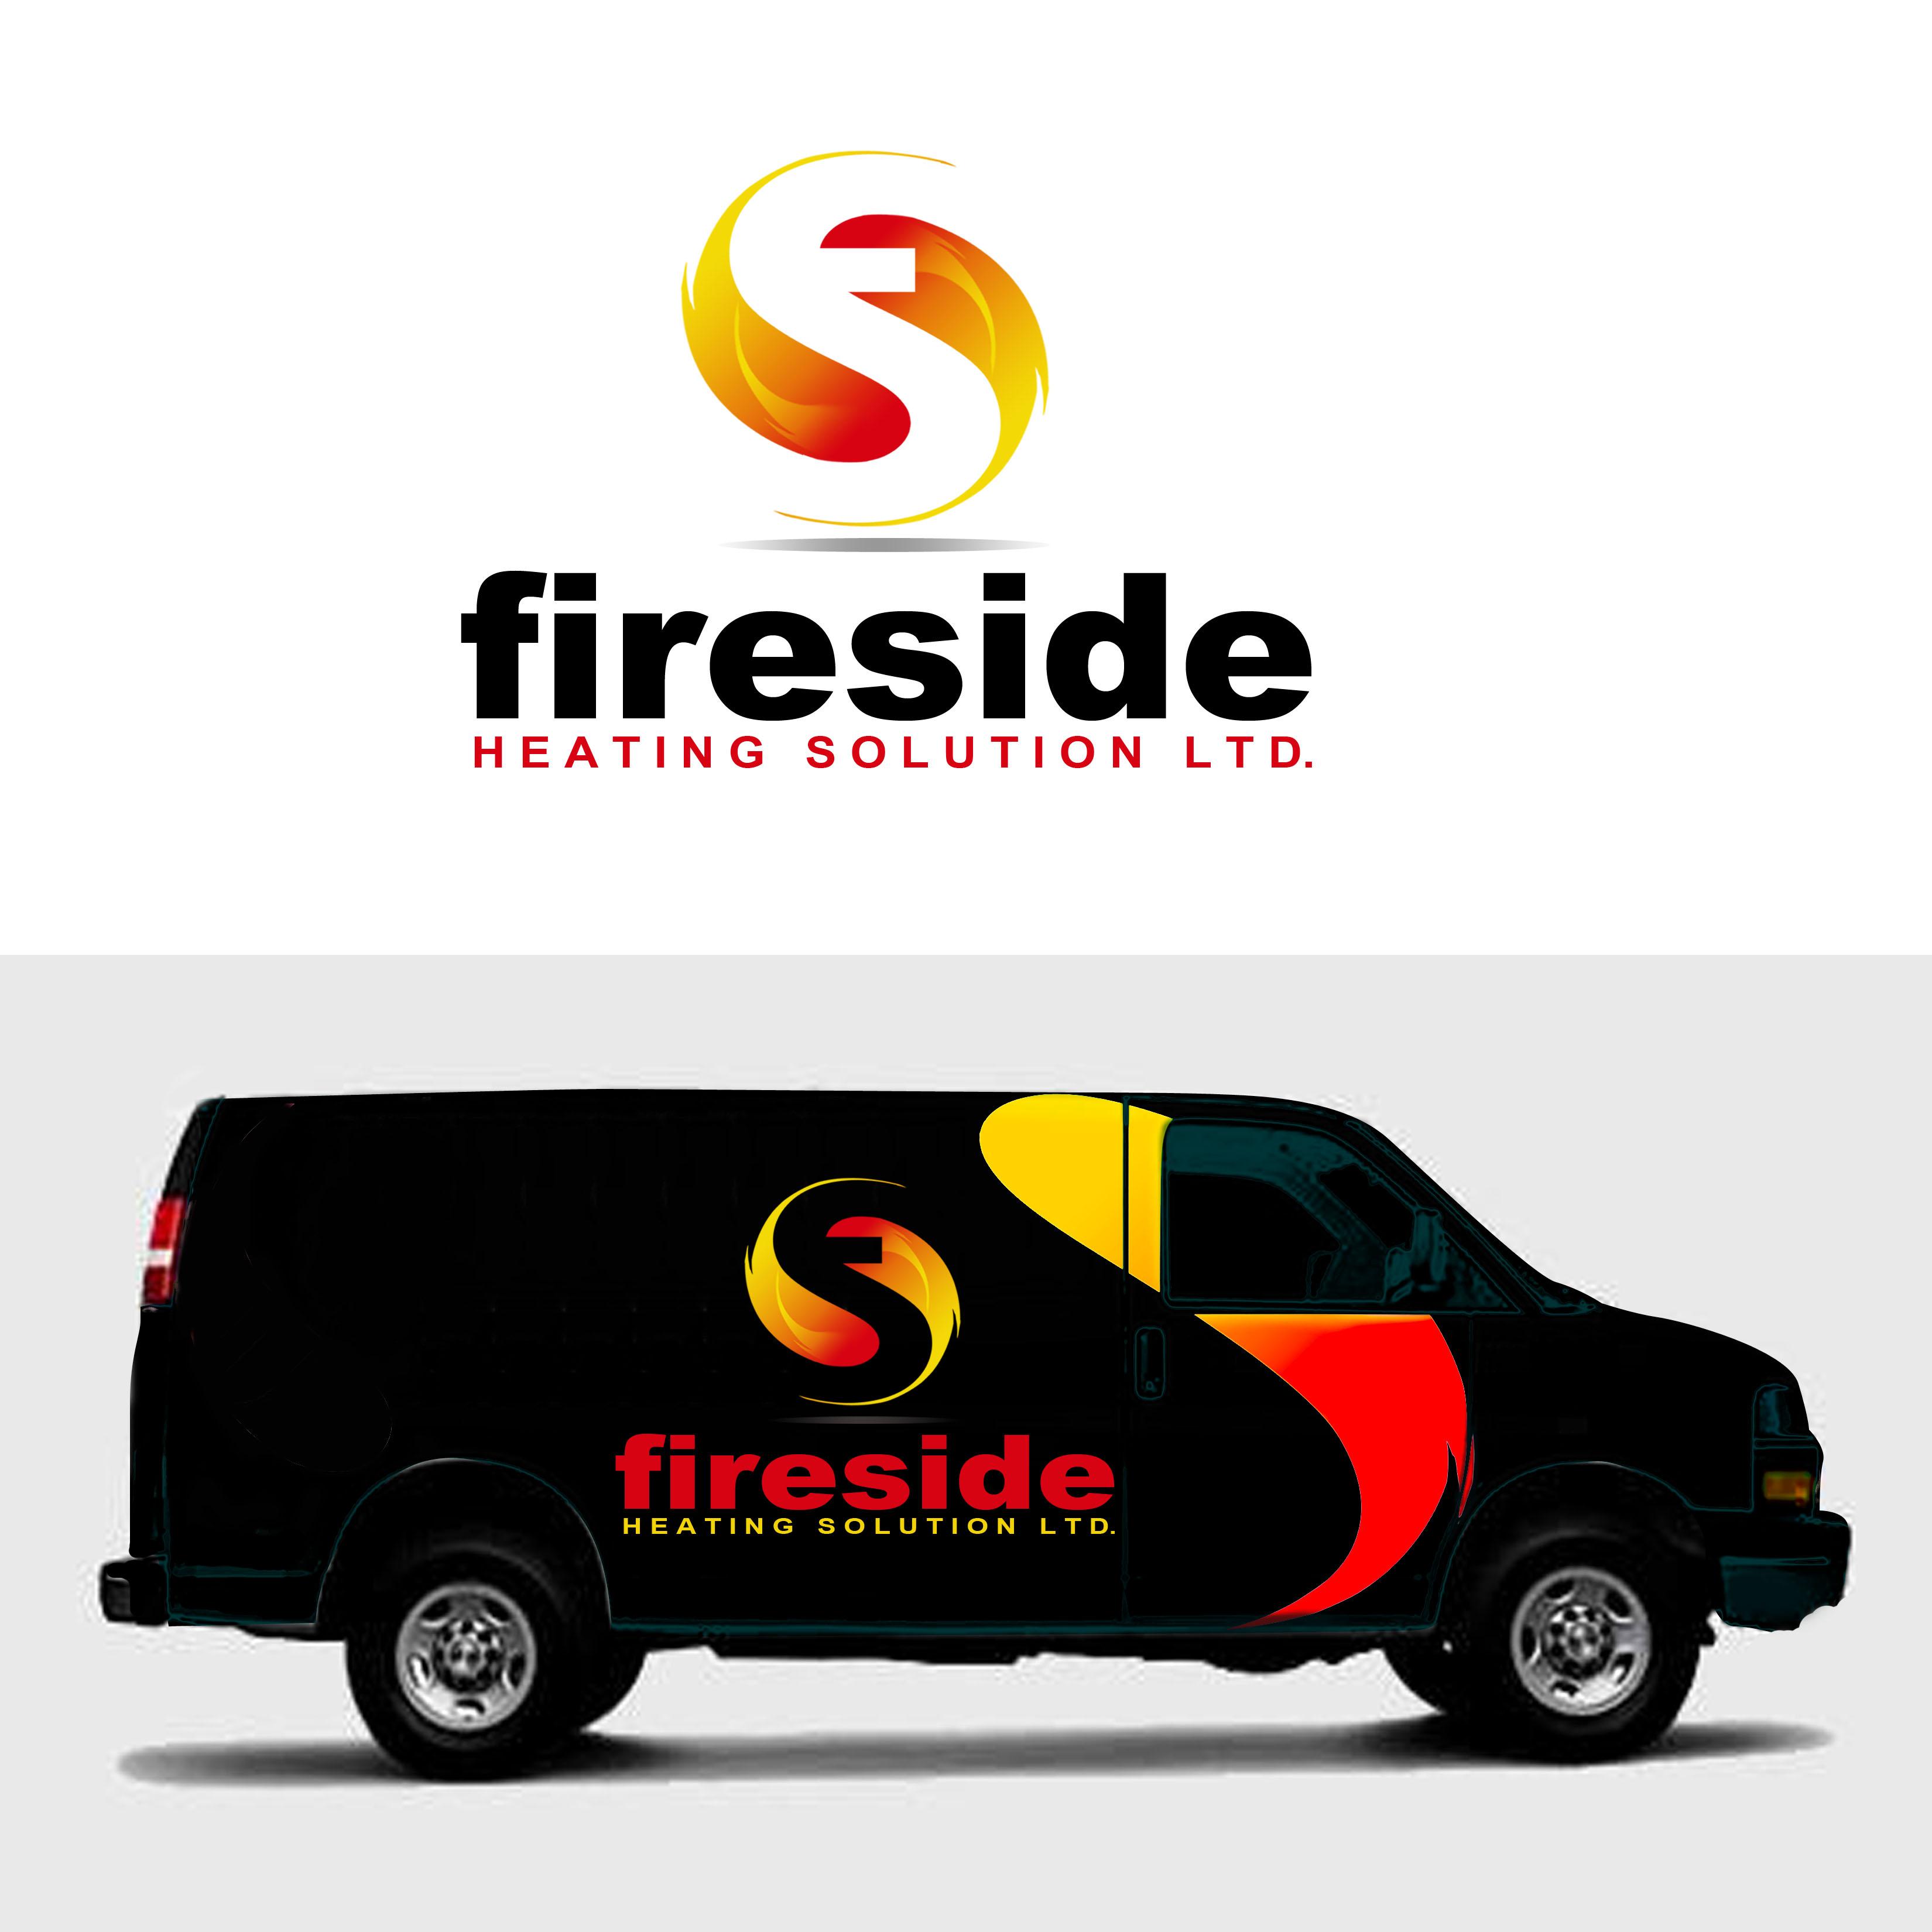 Logo Design by Allan Esclamado - Entry No. 103 in the Logo Design Contest Creative Logo Design for Fireside Heating Solutions Ltd..